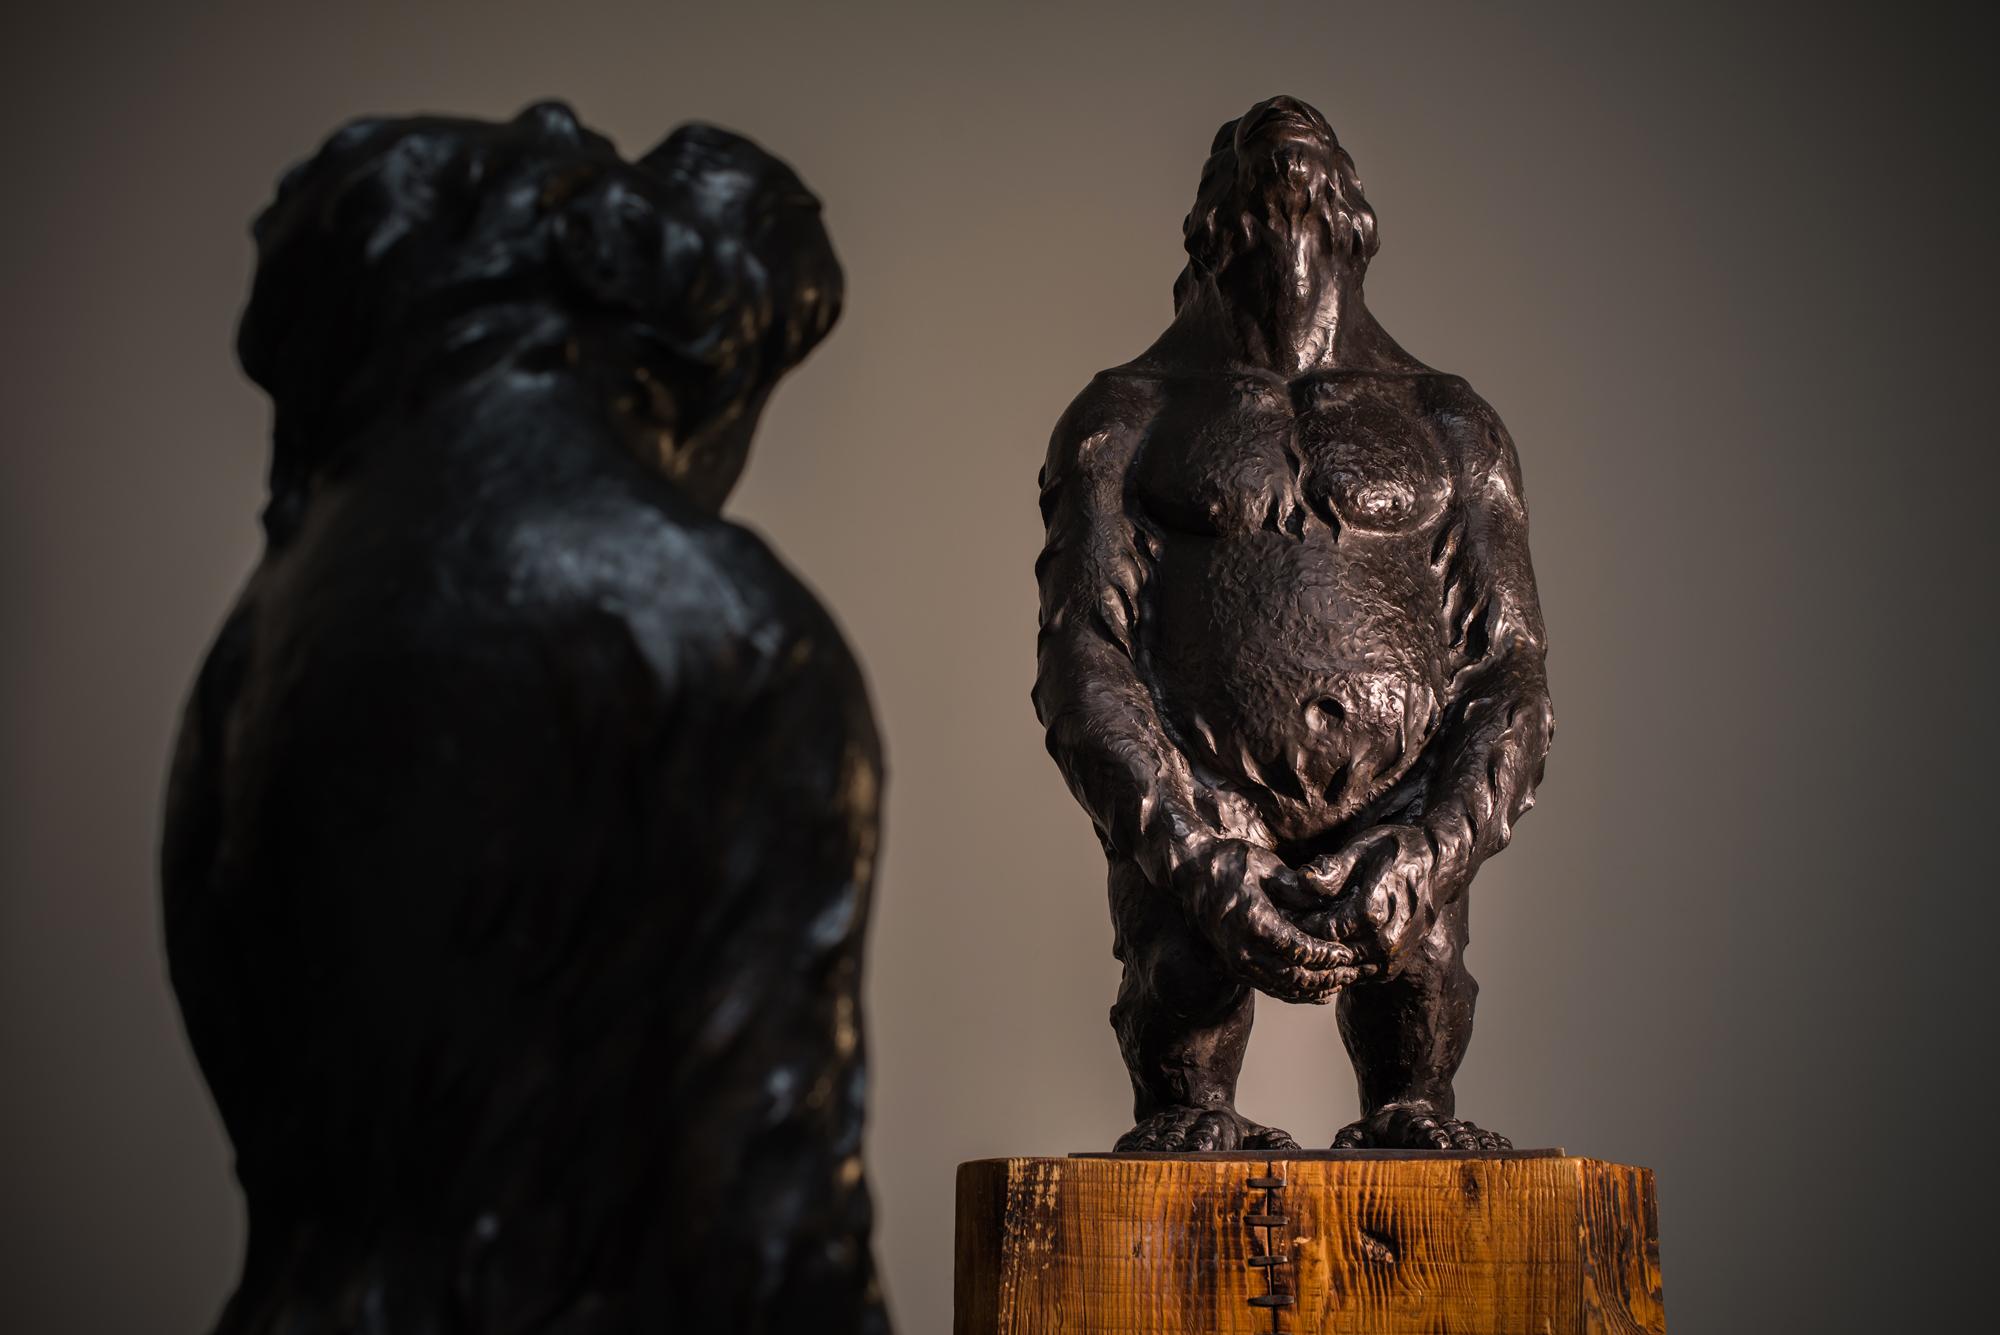 Liu Ruowang, Original Sin, 2011-2013, bronzo ph. Michele Stanzione, courtesy Lorenzelli Arte